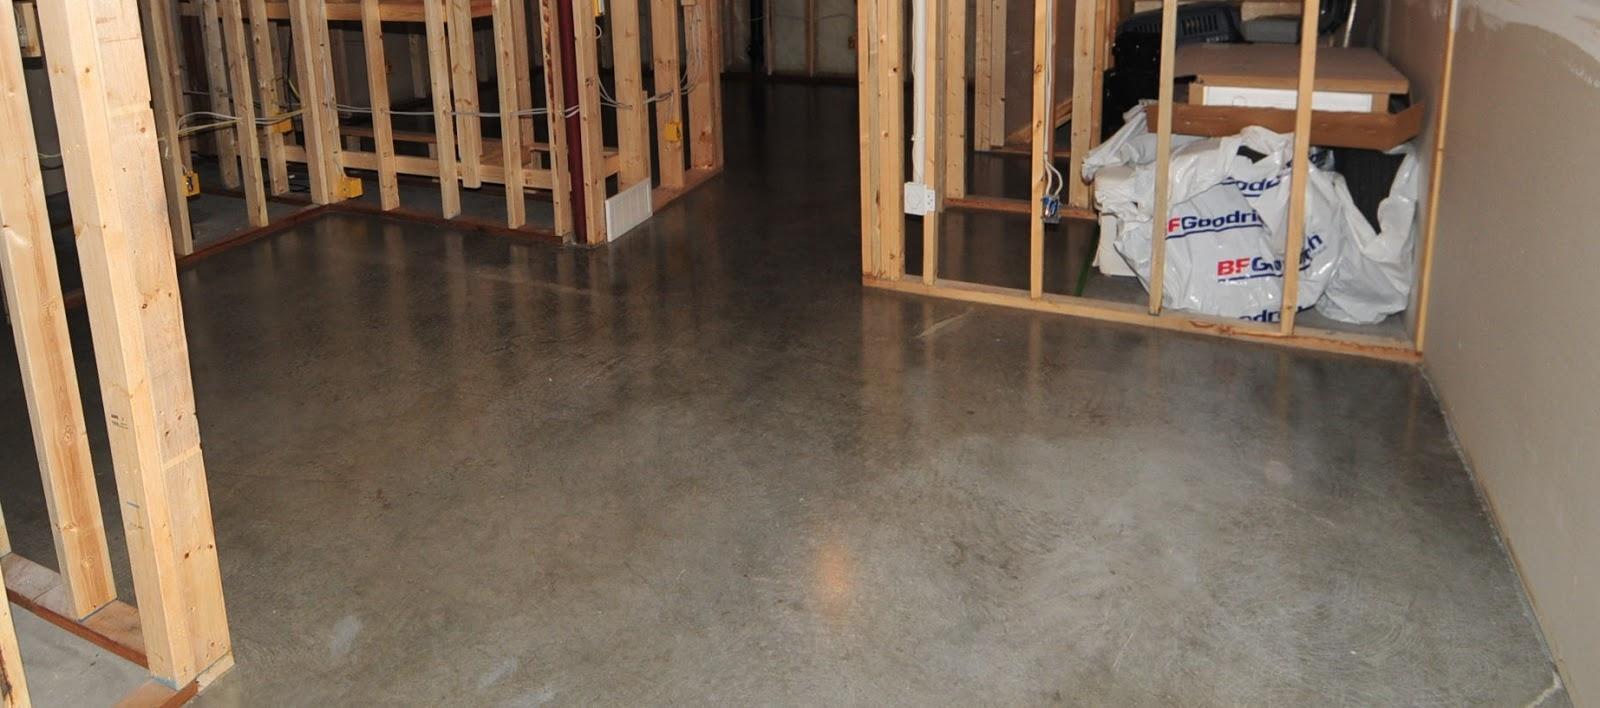 Sealing Basement Floor Before Finishing Sealing Basement Floor Before Finishing concrete basement floor sealer basement decoration ebp4 1600 X 708